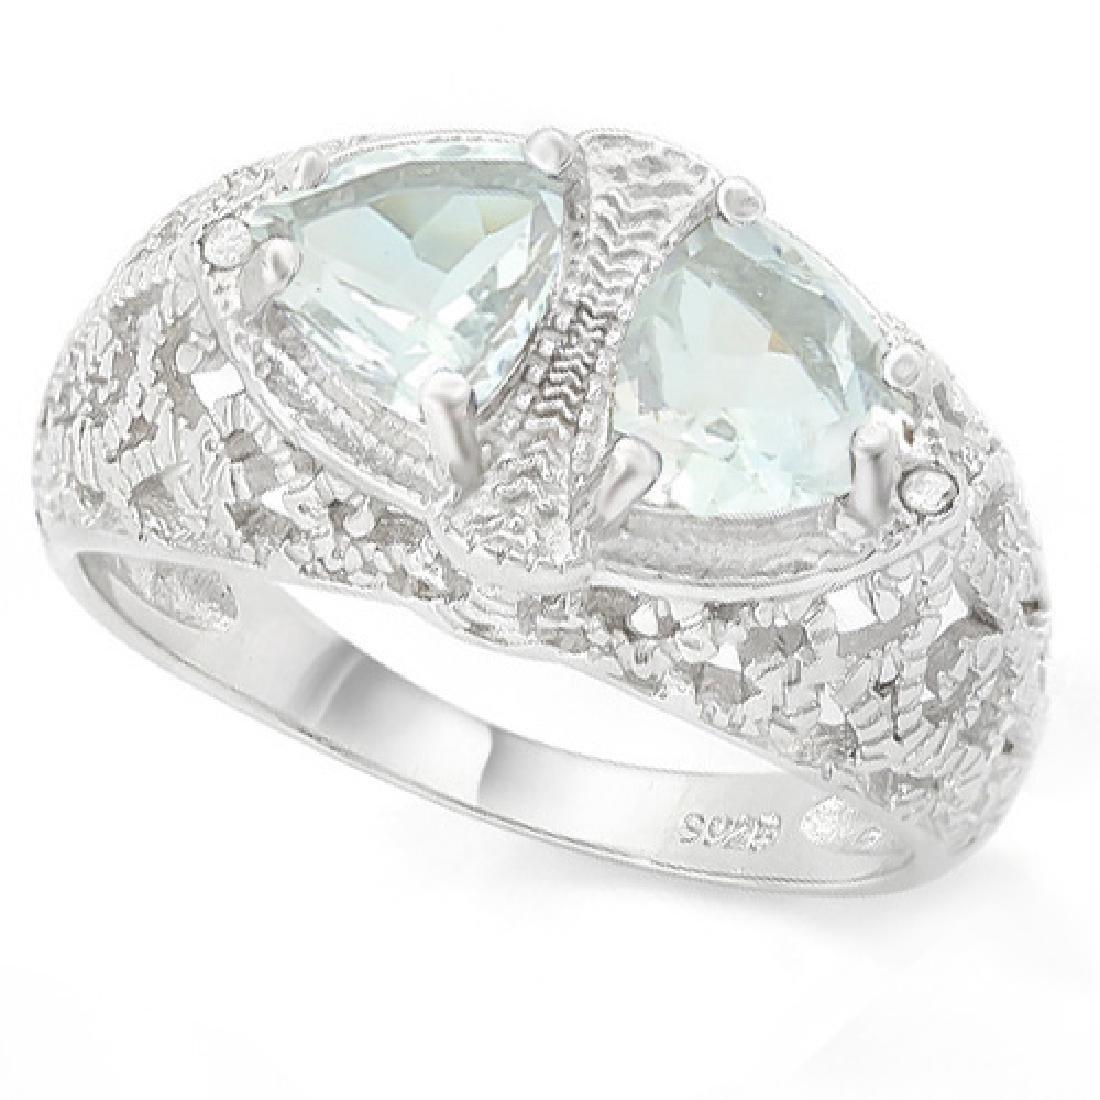 Filigree 2 Stone Aquamarine Ring with Diamond in